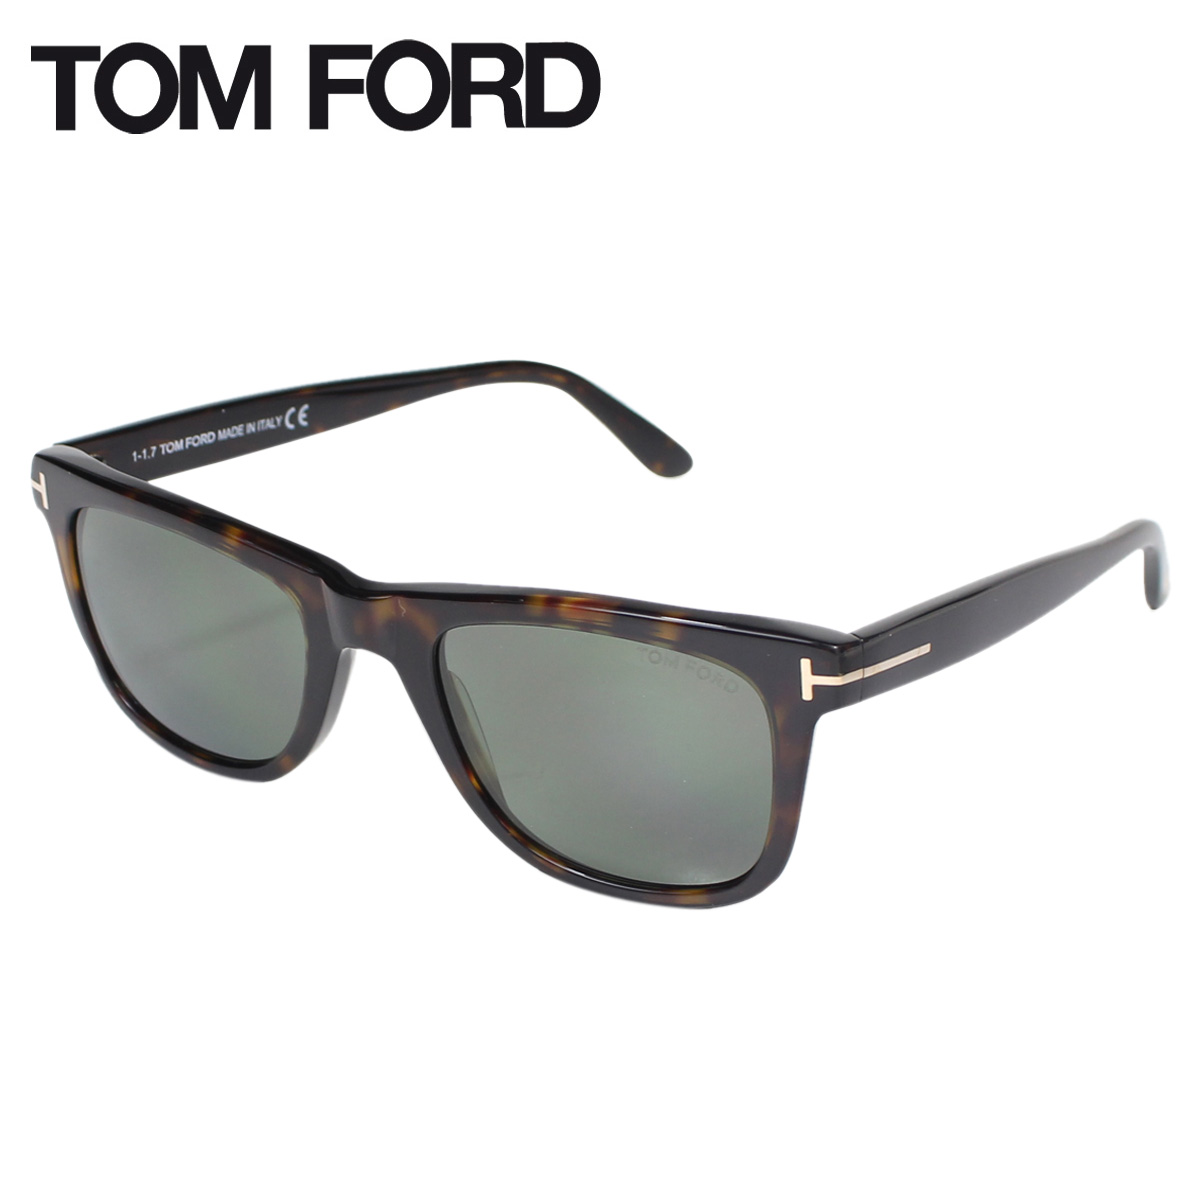 6deb15d5887 ALLSPORTS  TOM FORD Tom Ford sunglasses glasses men gap Dis eyewear FT0336 LEO  SQUARE SUNGLASSES brown  8 3 Shinnyu load   178